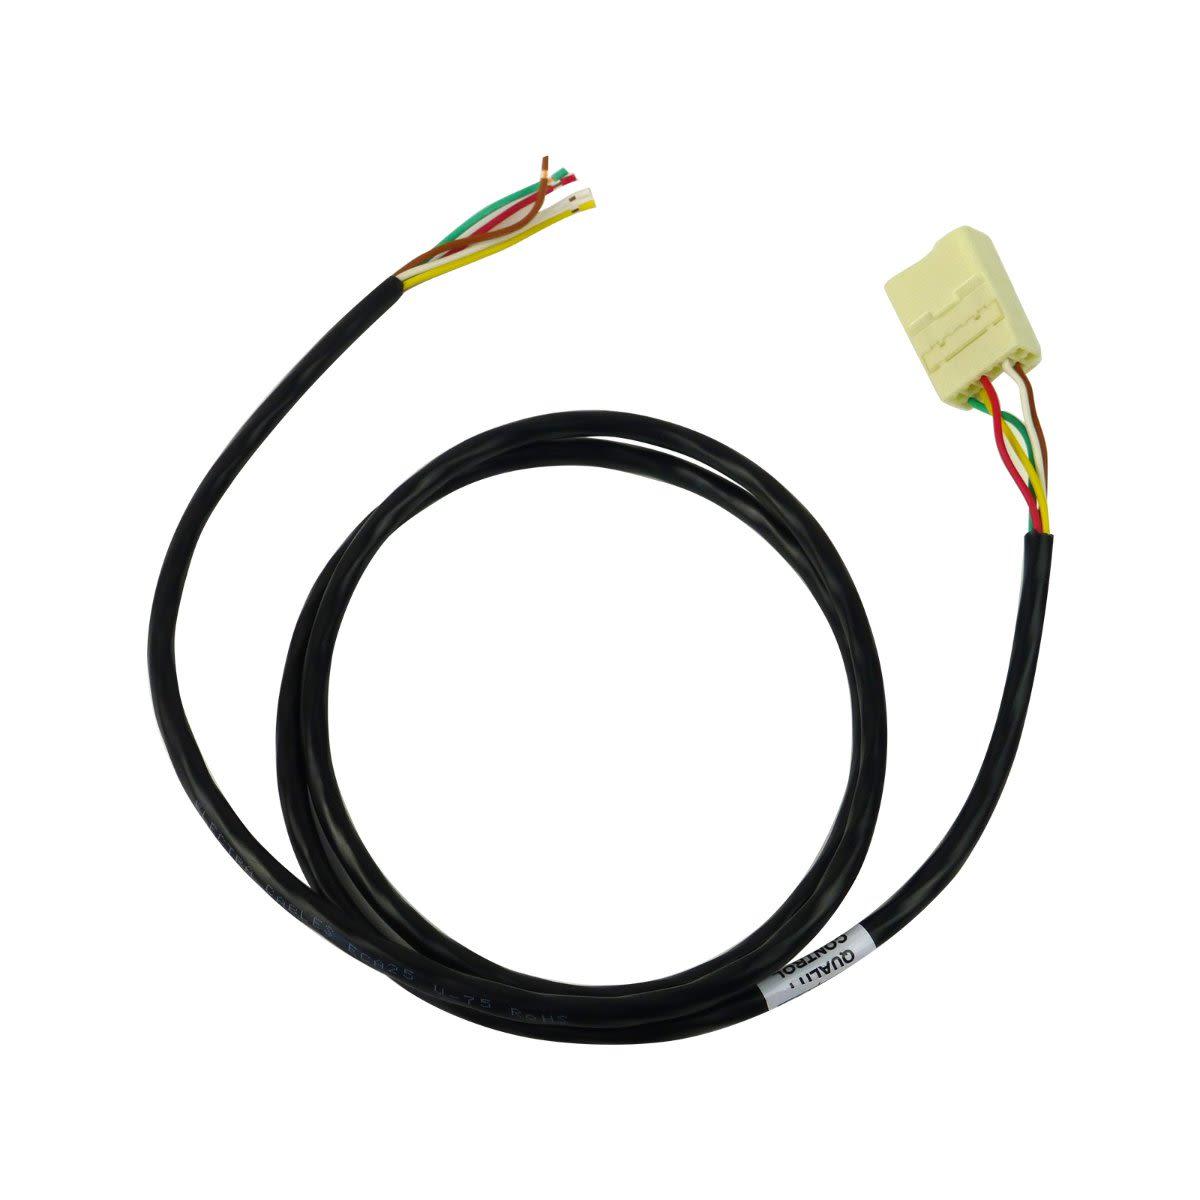 TAG Towbar Wiring Direct Fit to suit Subaru Impreza (08/2007 - 2018)